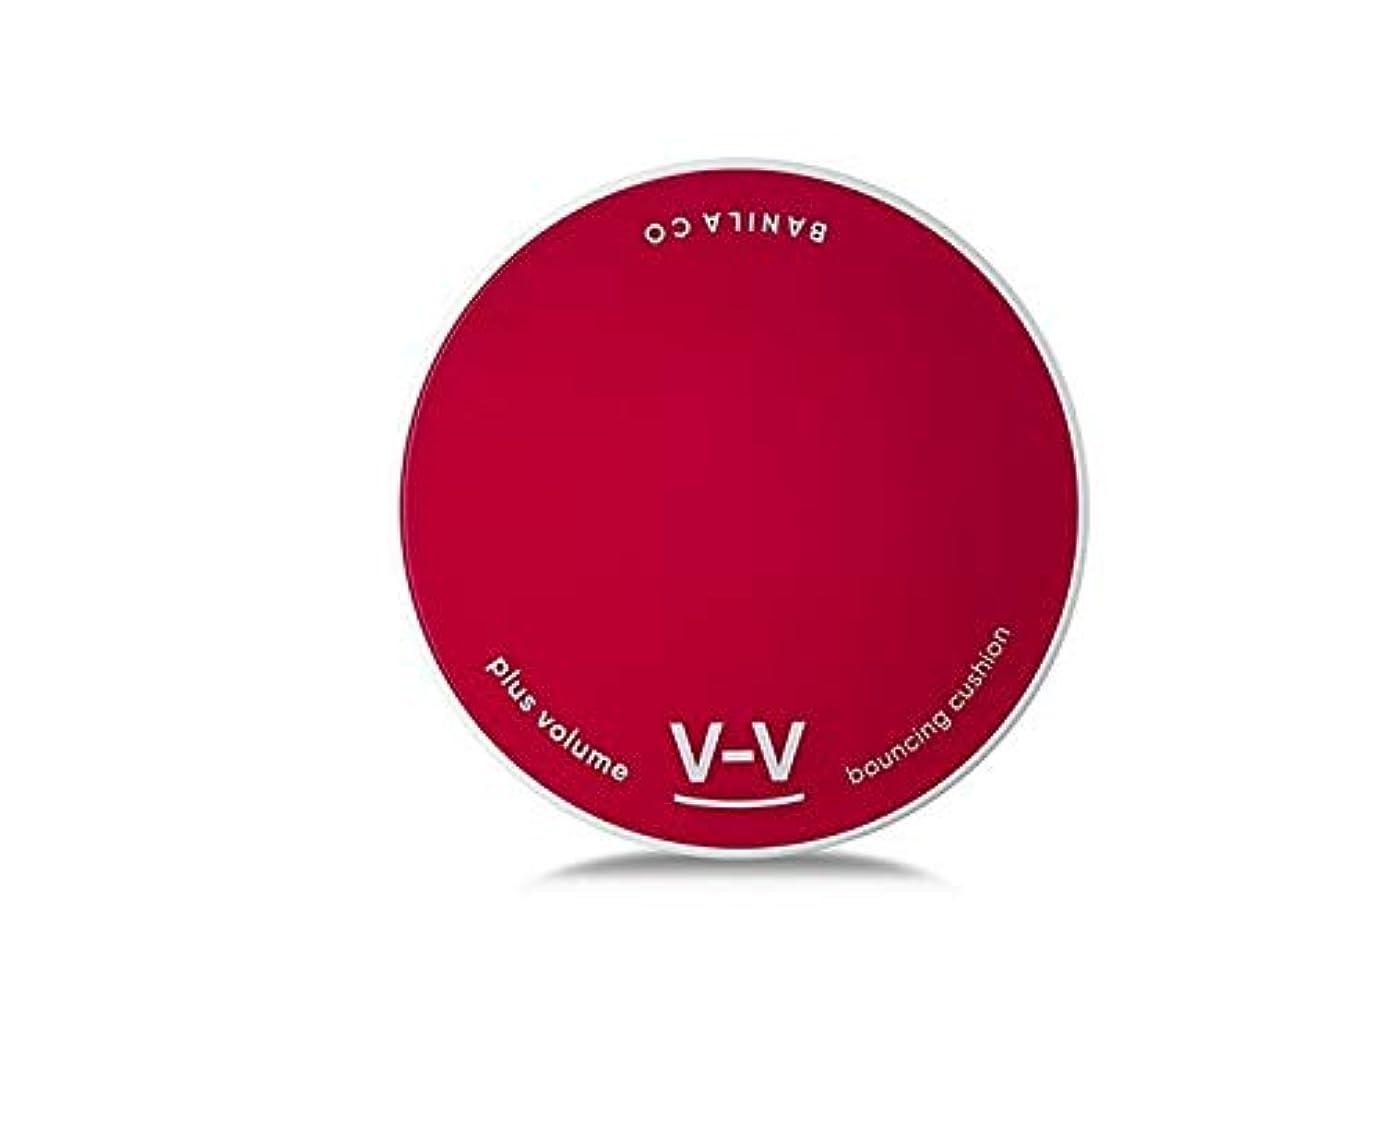 banilaco V-Vバウンシングクッション+詰め替え/V-V Bouncing Cushion + Refill 15g * 2# BE20 [並行輸入品]